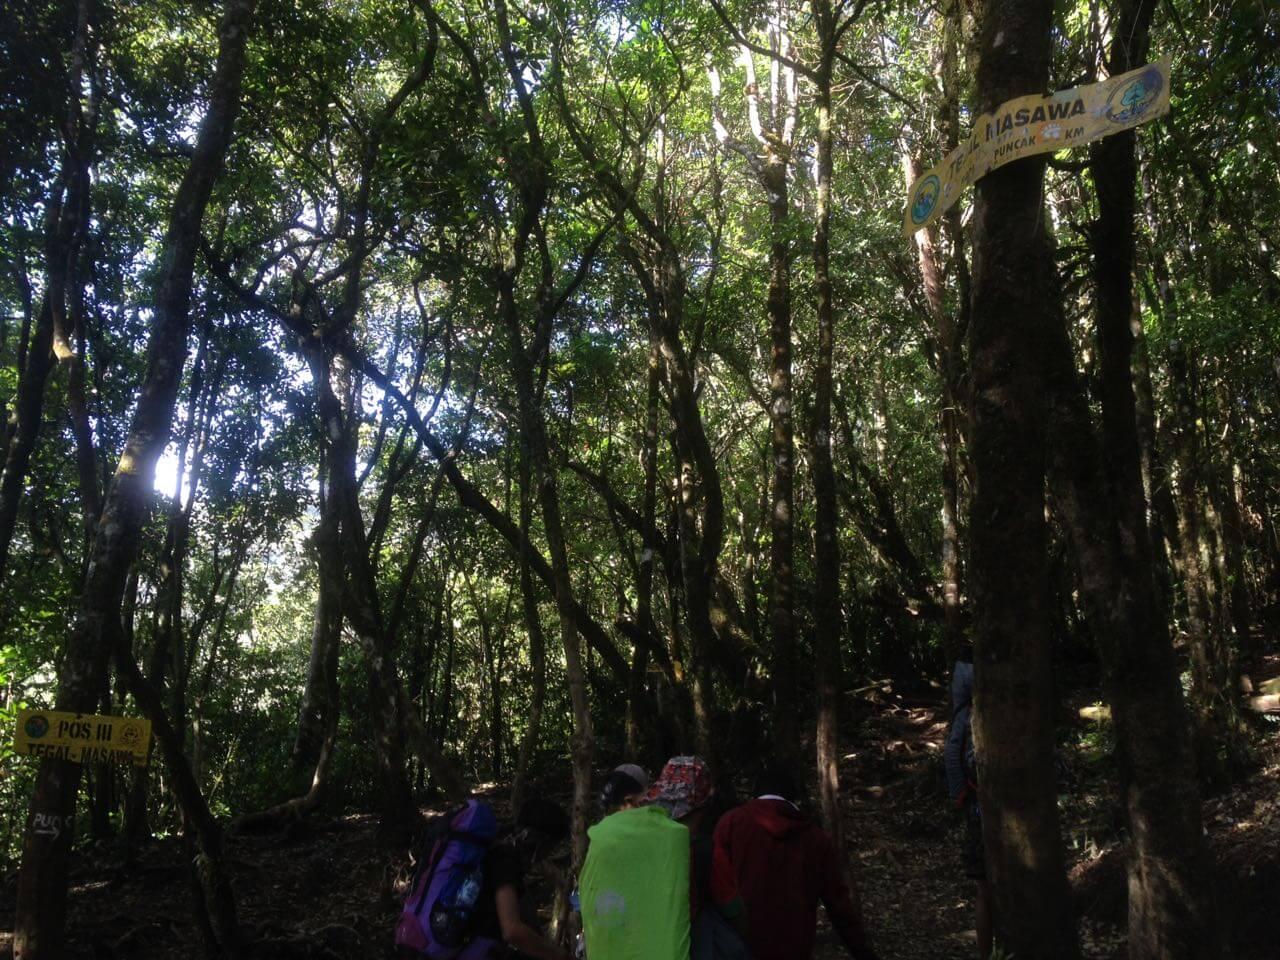 Pos 3 Tegal Masawa, Gunung Ciremai via Apuy (Foto oleh : @afvendiant)